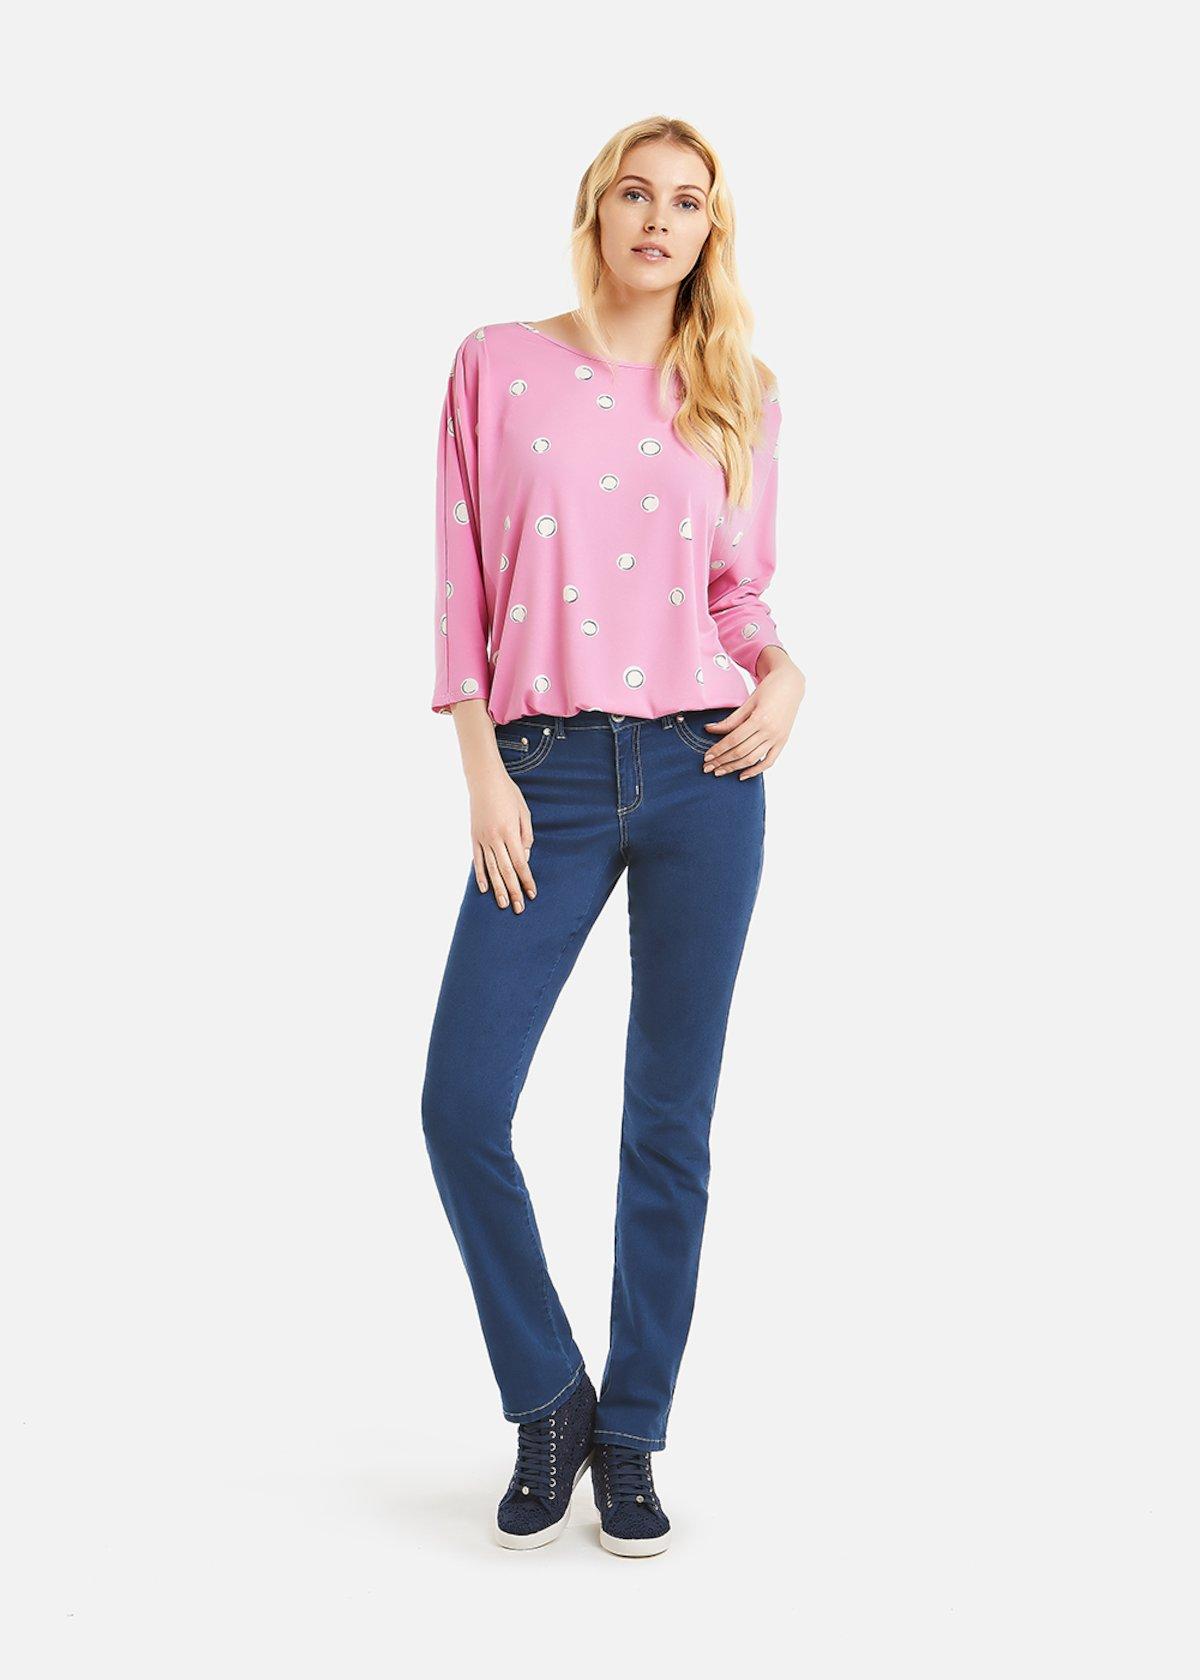 Donkey Skinny jeans 5 pockets